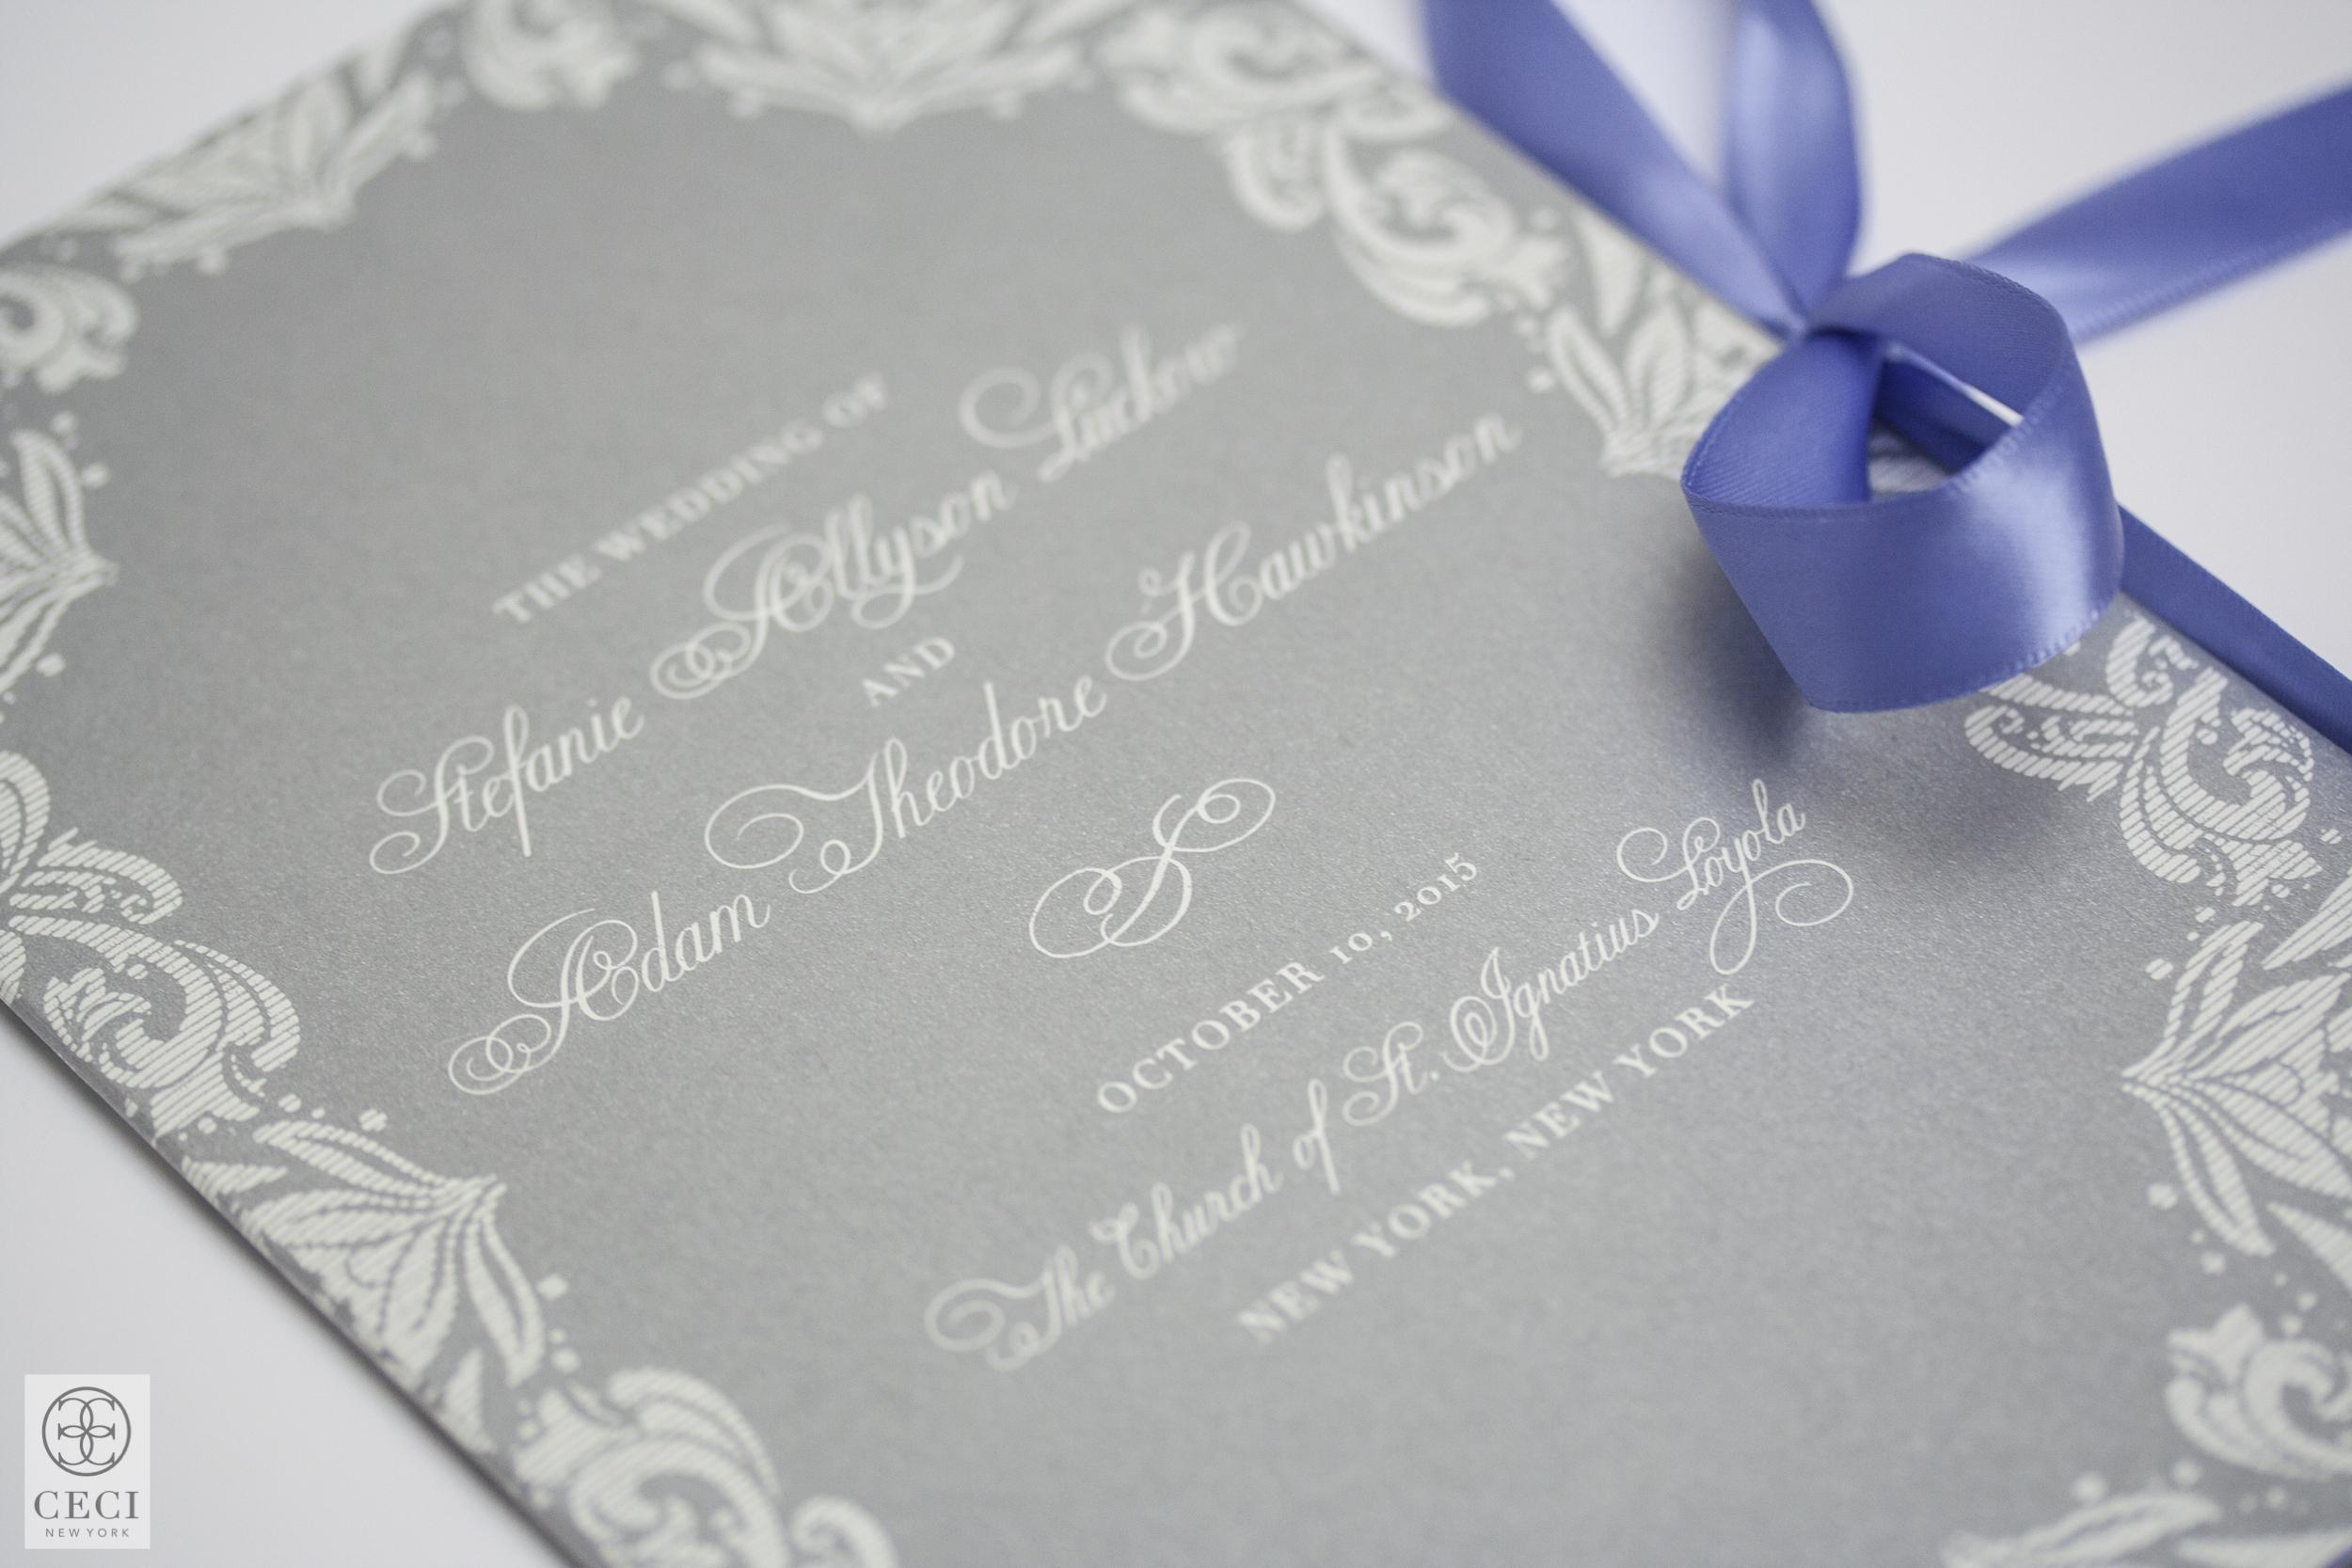 ceci_new_york_wedding_invitation_design_custom_watercolor_purple_damask_lasercut_-7.jpg